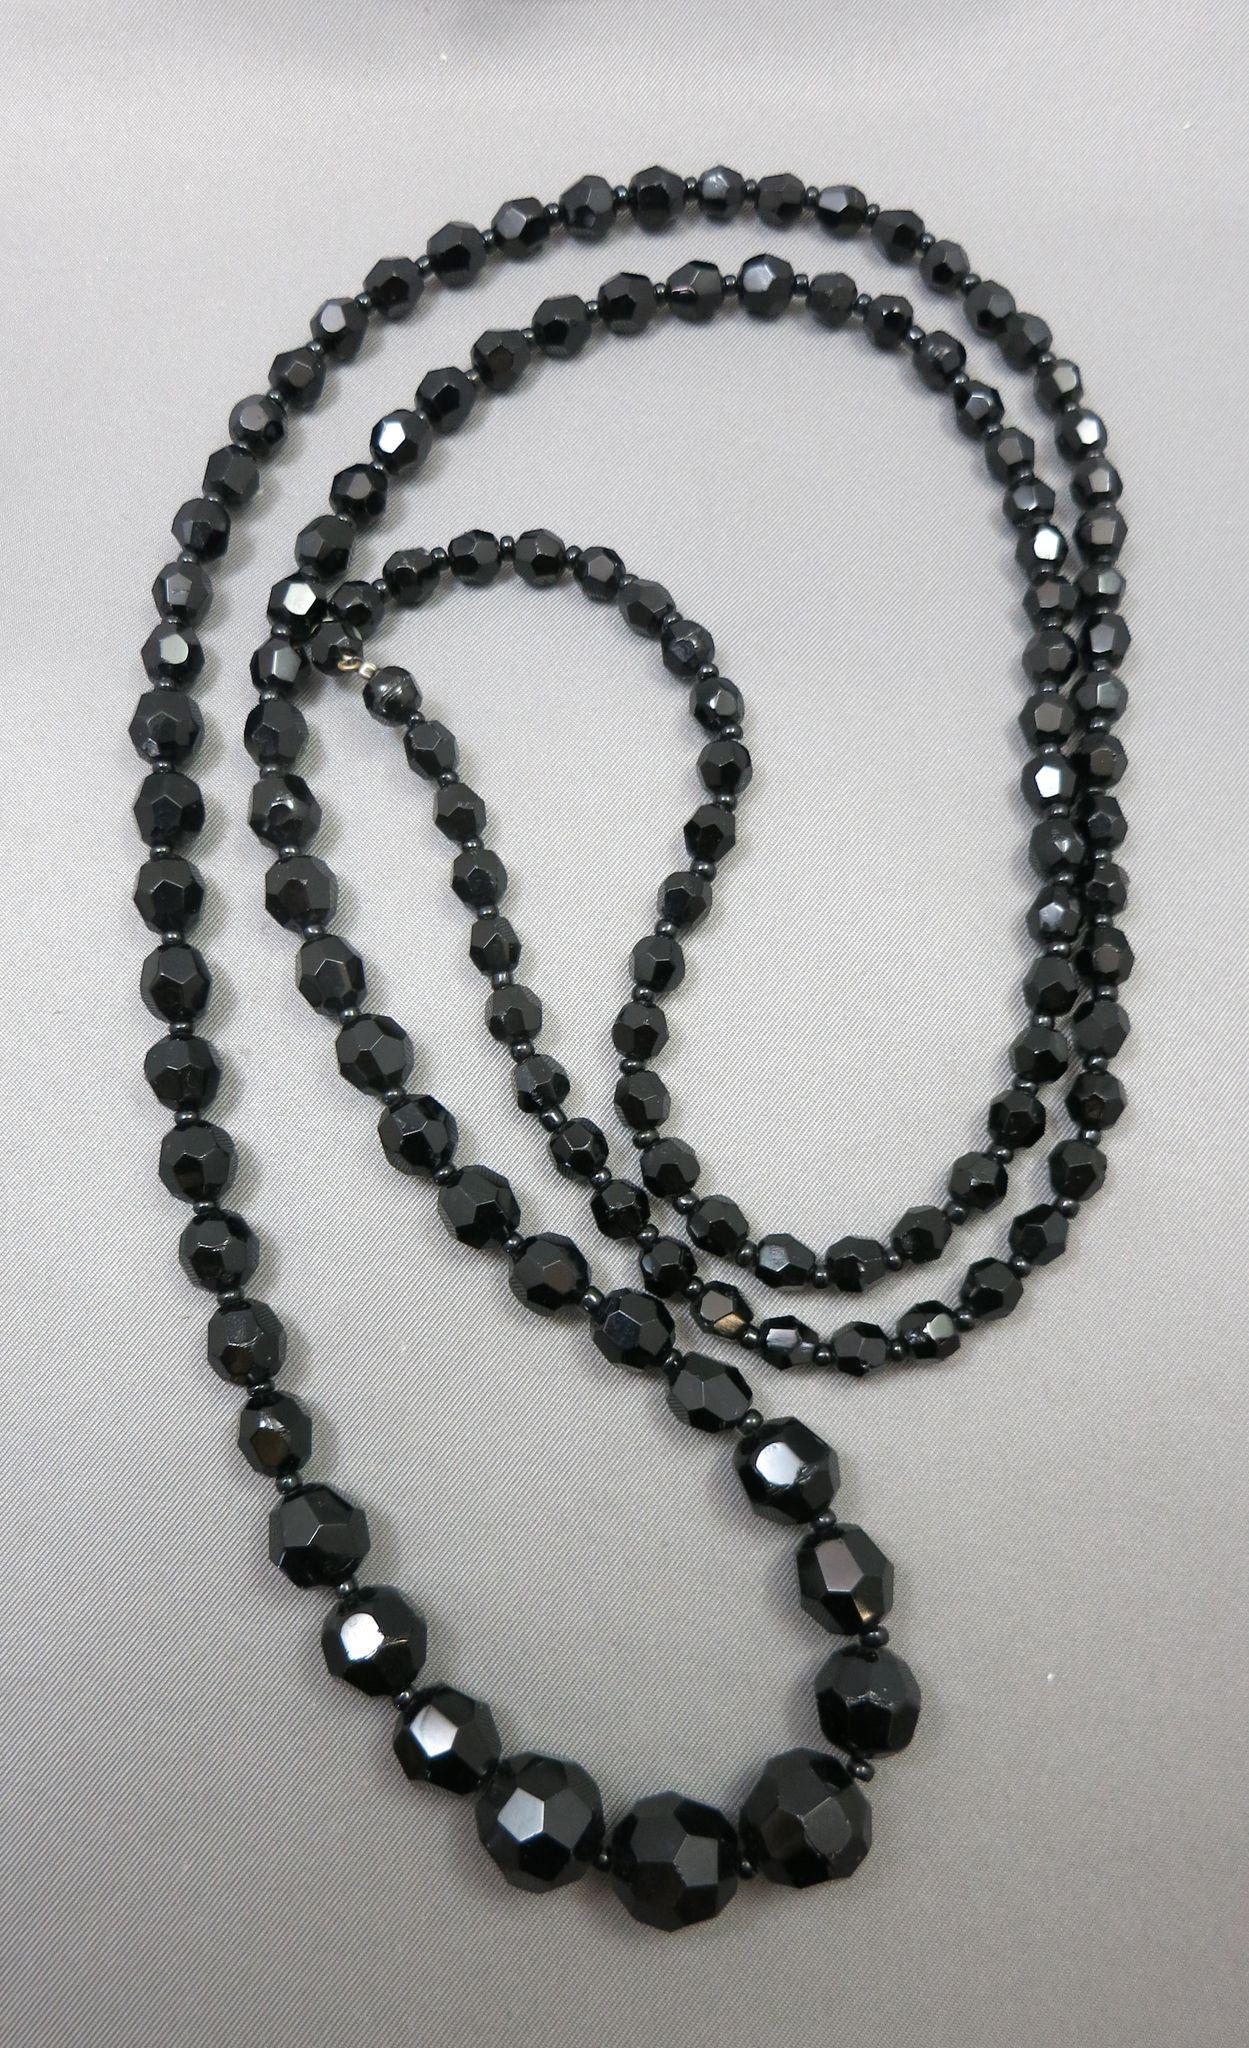 VINTAGE 40 Inch  Graduated Black  Glass Necklace